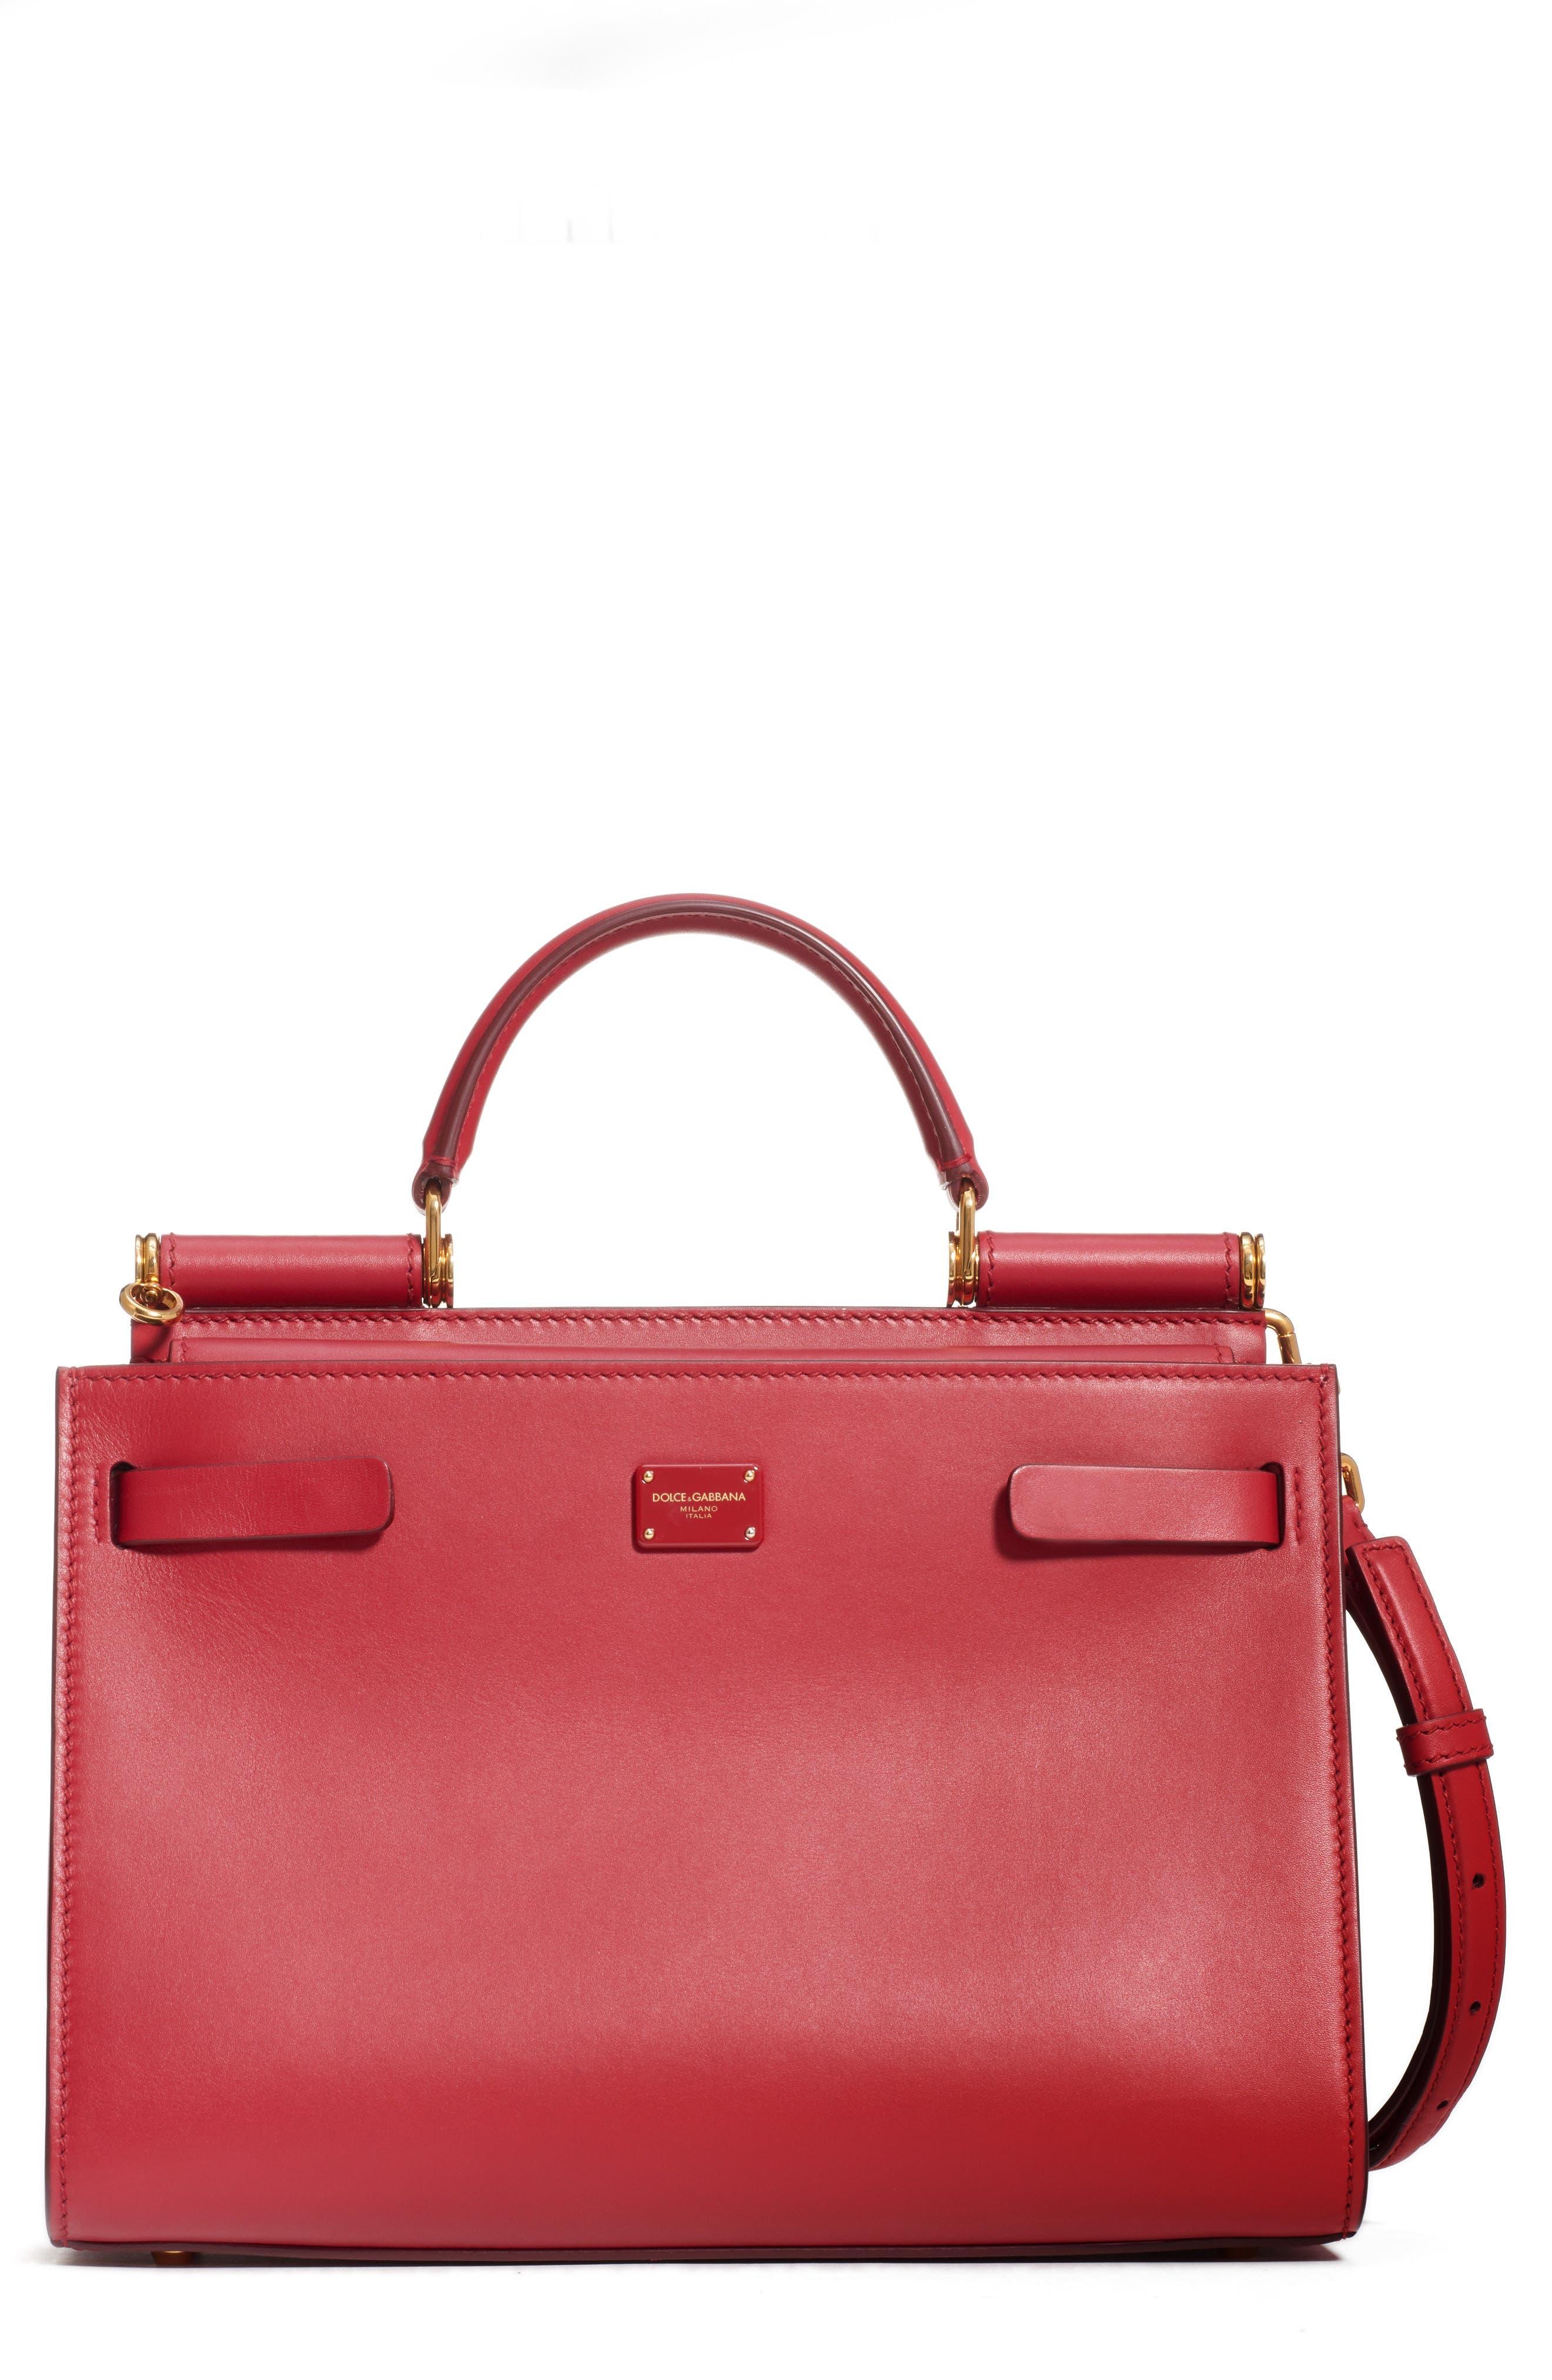 Dolce&Gabbana Sicily 62 Leather Satchel   Nordstrom